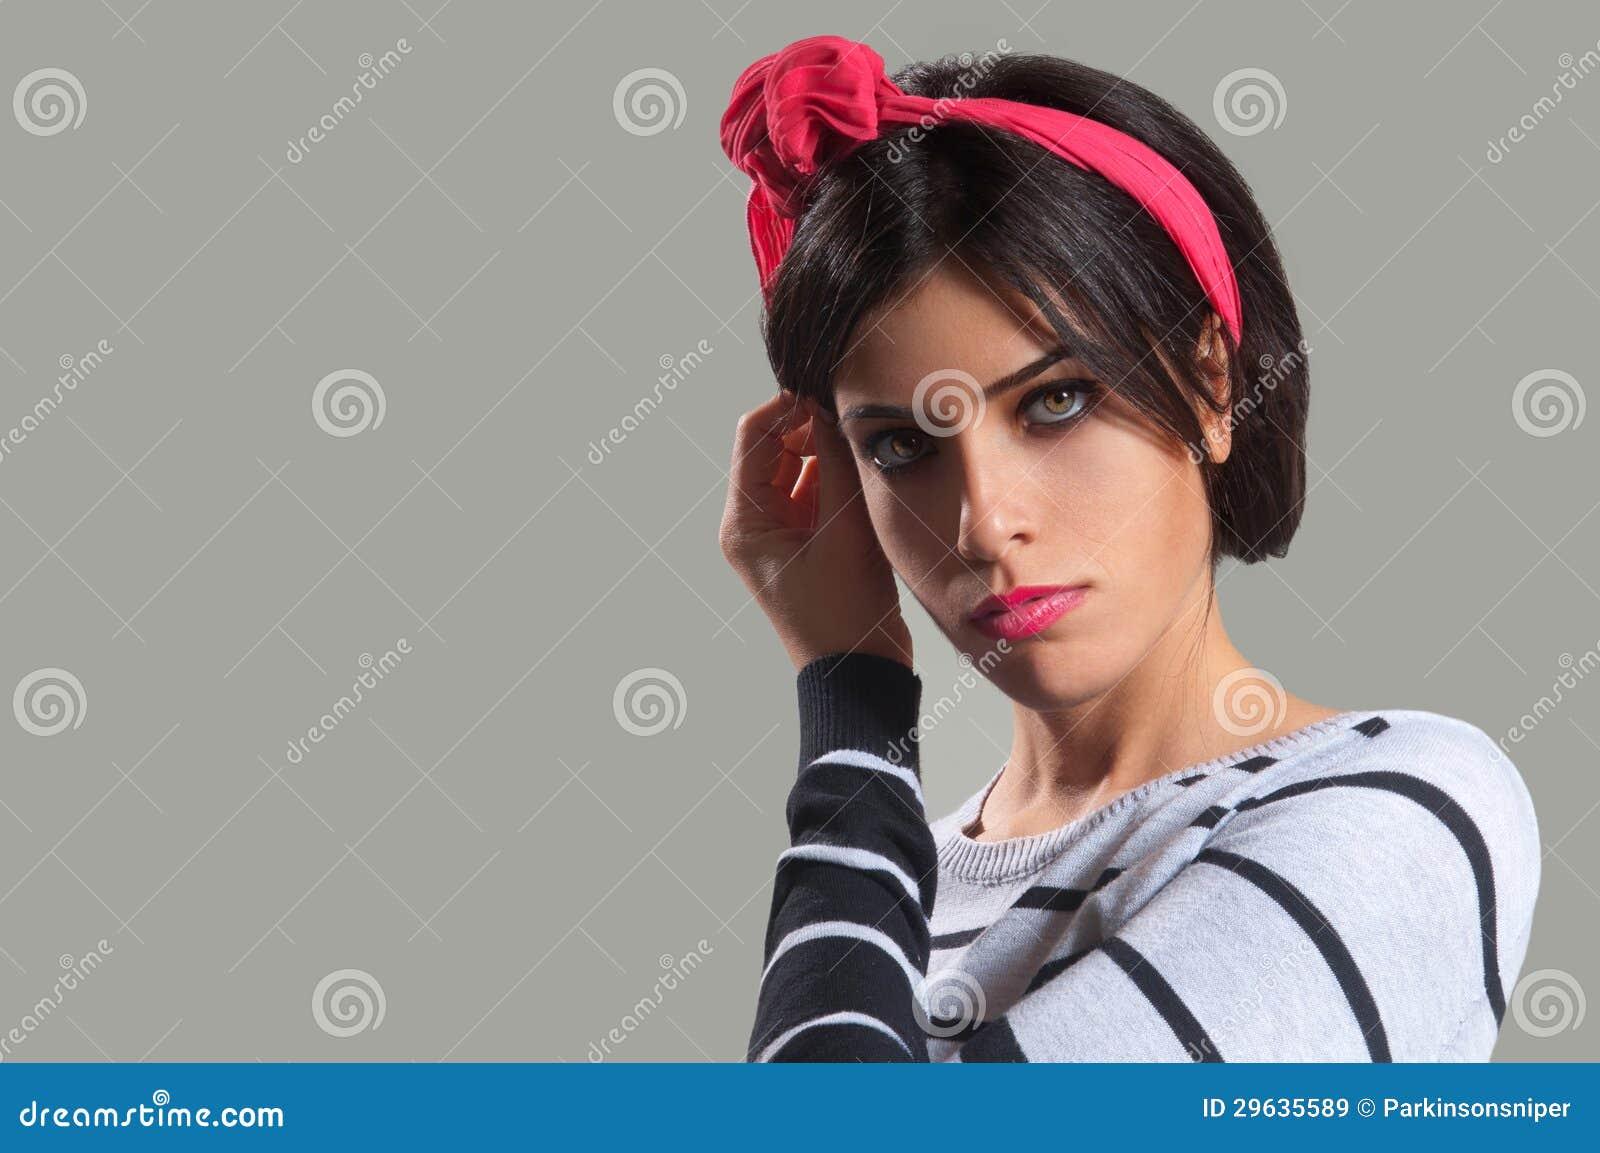 Beautiful Girl with Hair Band